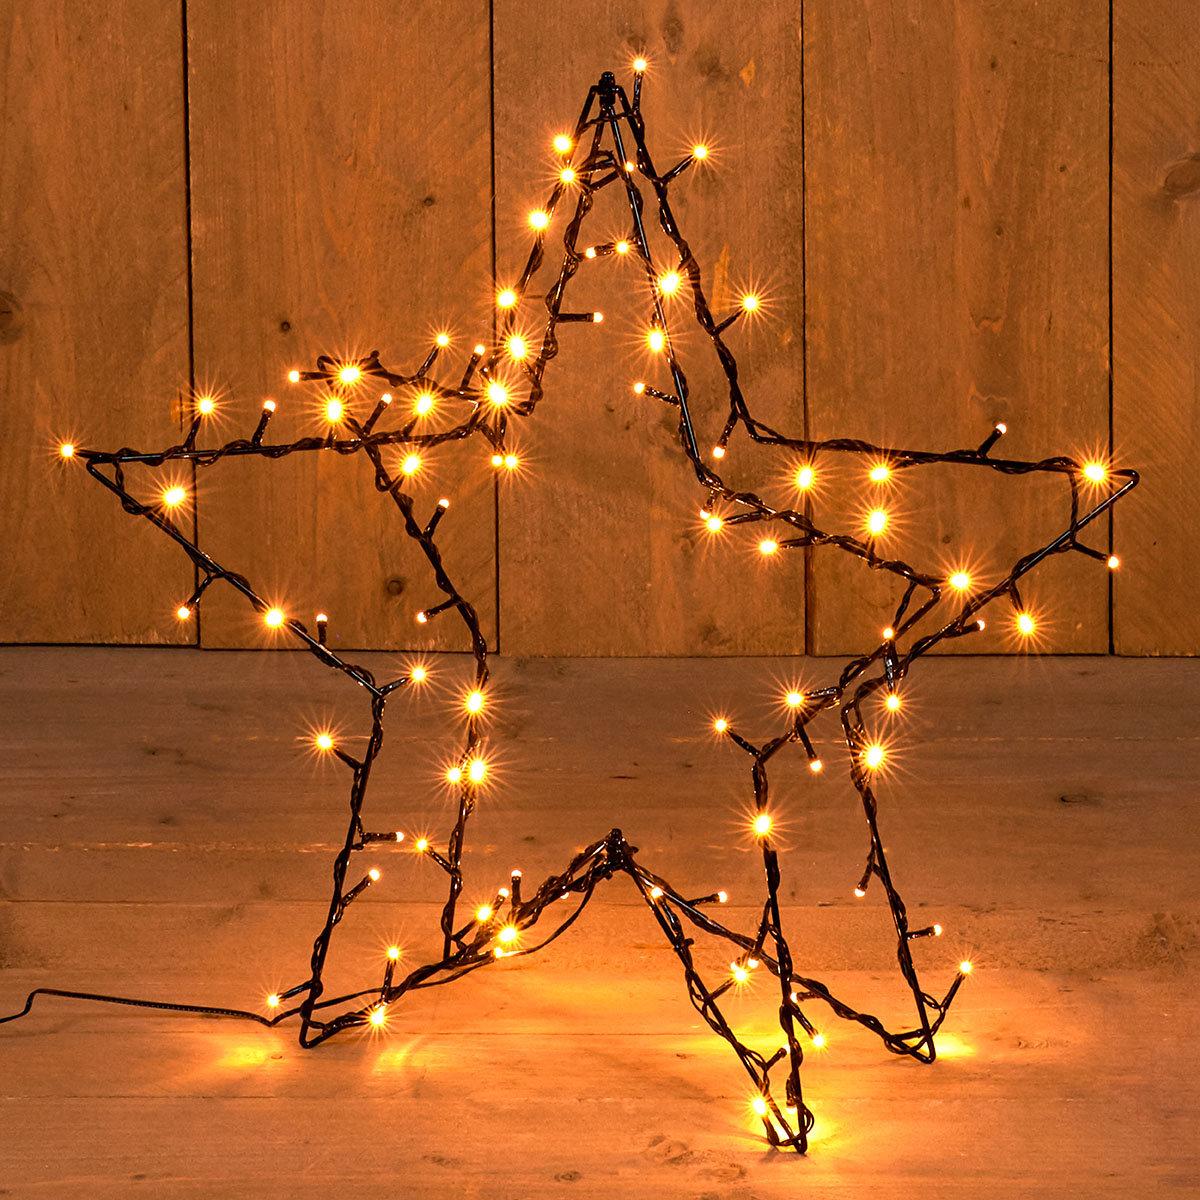 3D Stern mit LED-Beleuchtung, 90 LEDs, 57 cm